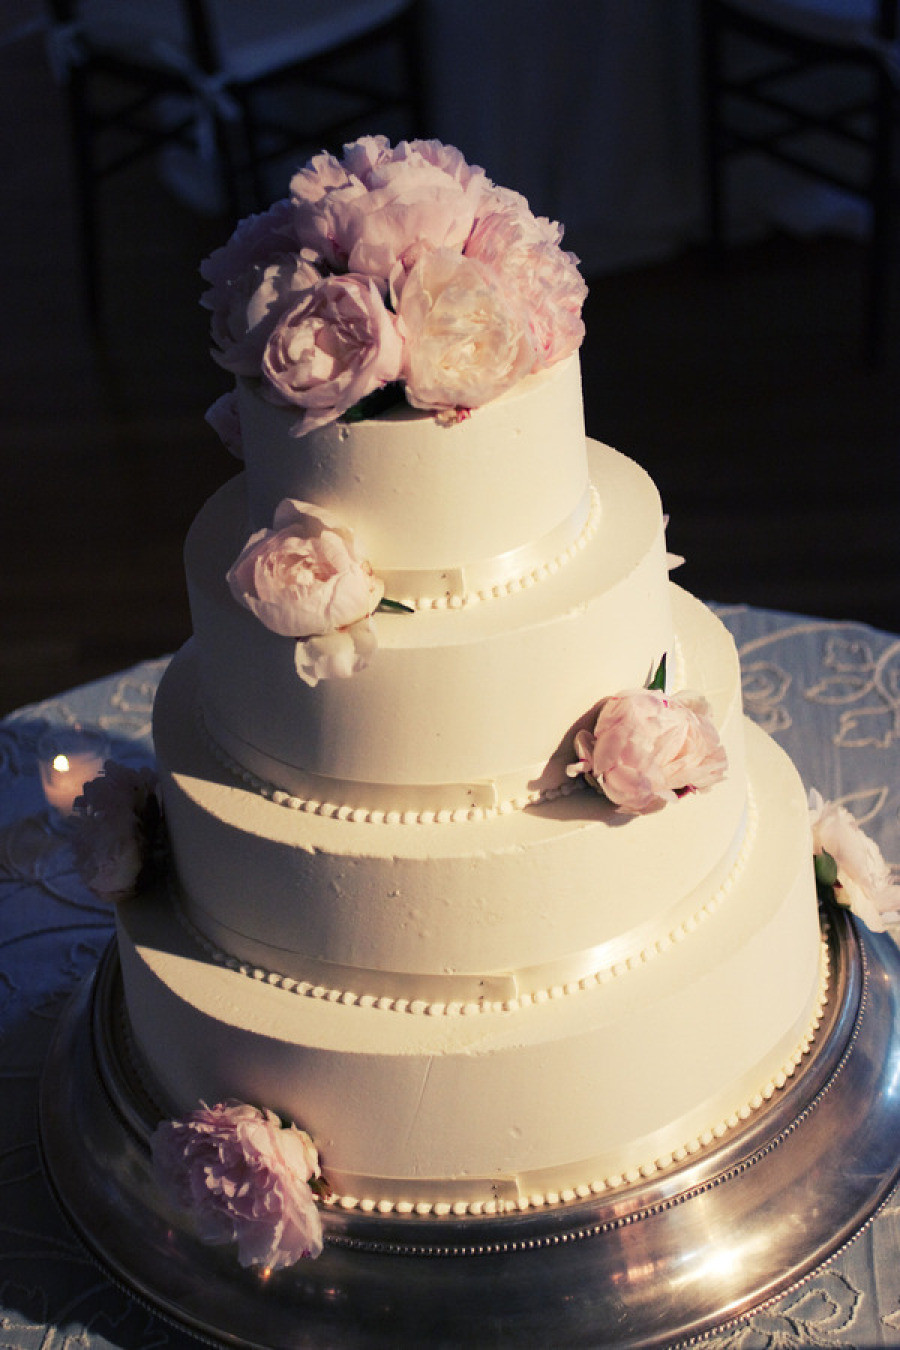 Prettiest Wedding Cakes  25 Jaw Dropping Beautiful Wedding Cake Ideas MODwedding